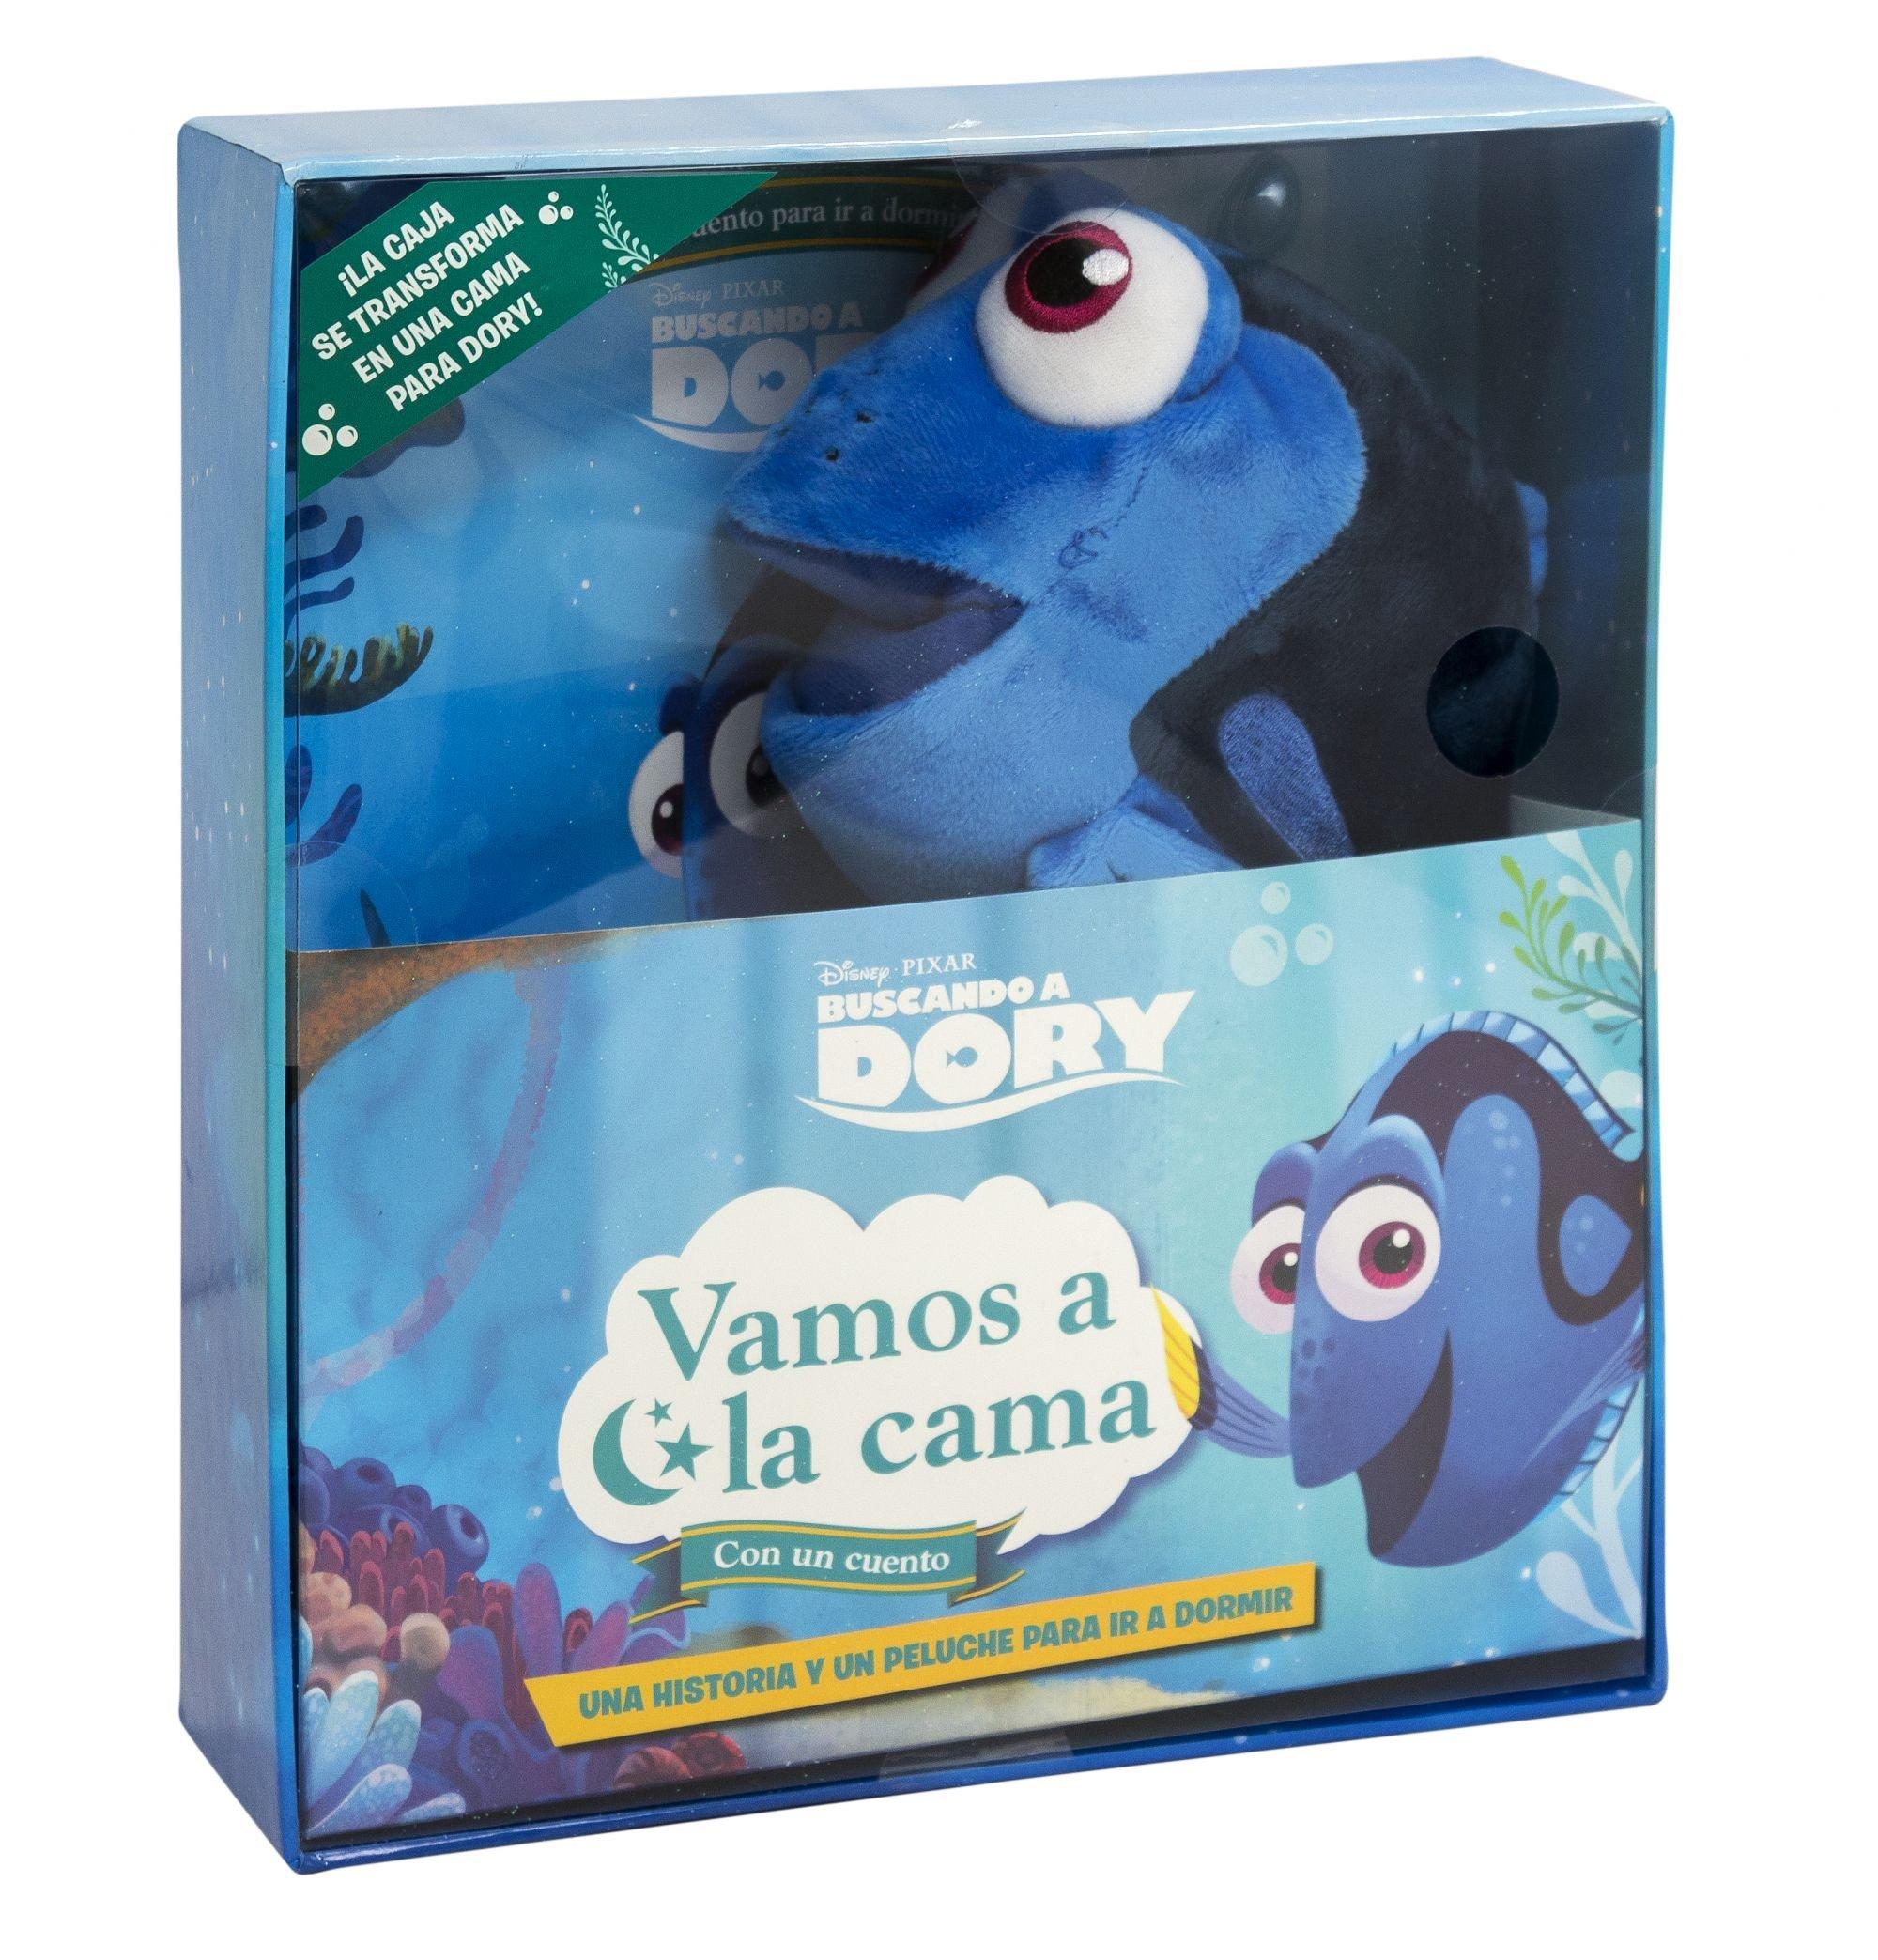 Vamos a la cama: Disney: 9788499518114: Amazon.com: Books